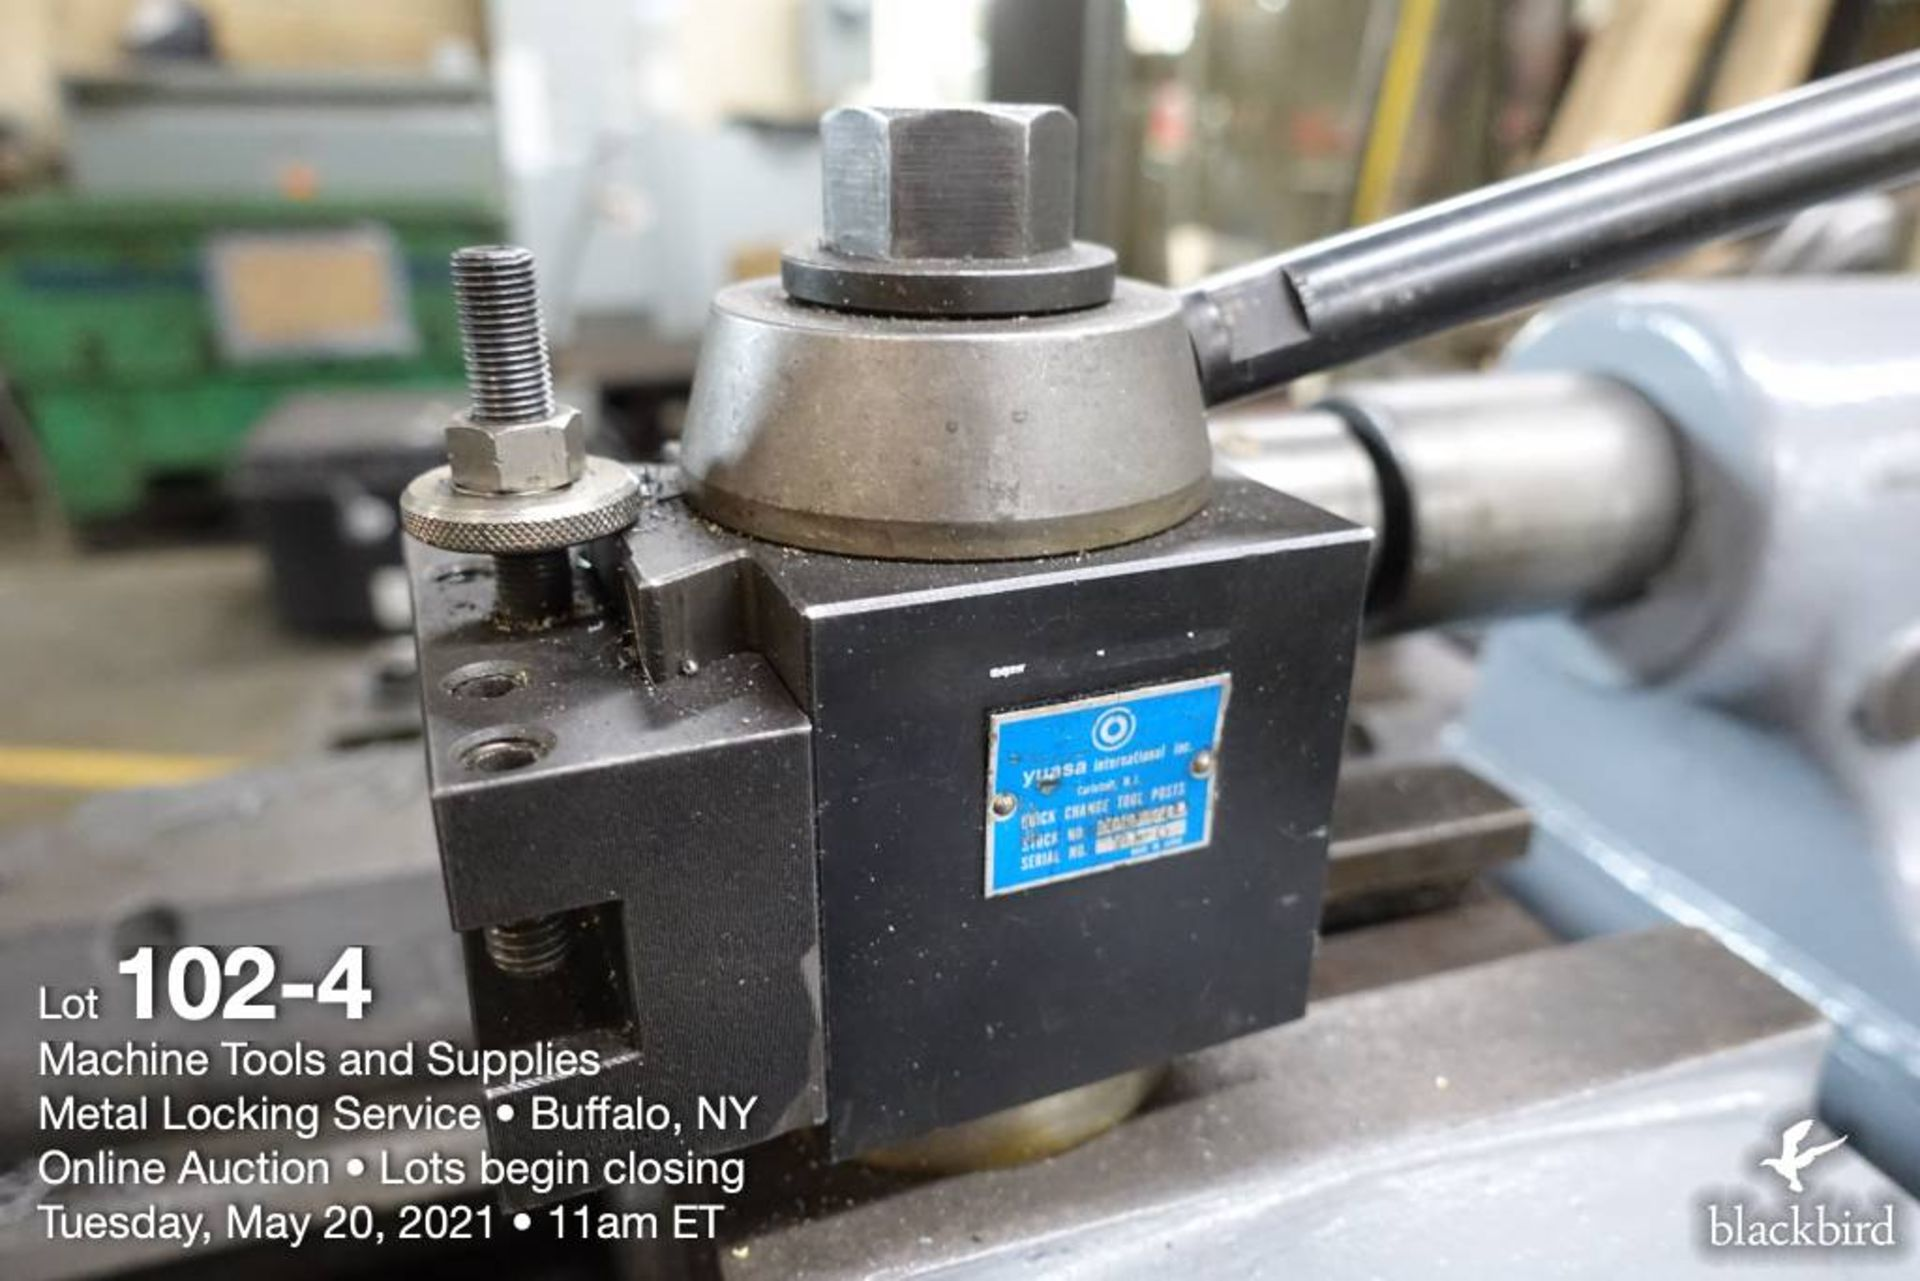 Reed-Prentice tool room lathe, Yuasa tool post - Image 5 of 7